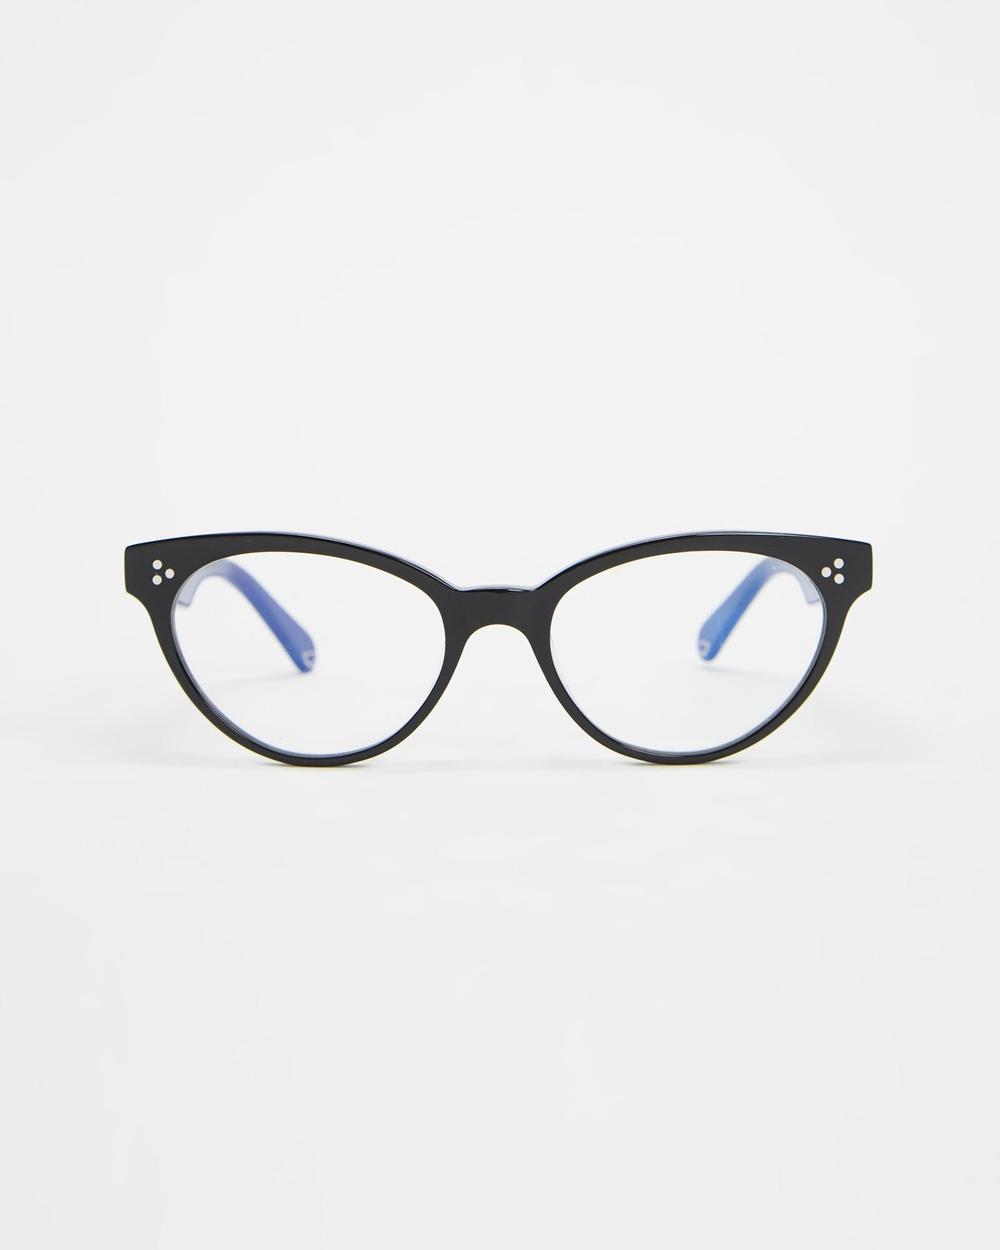 Pacifico Optical Francis Black & Blue Light Lenses